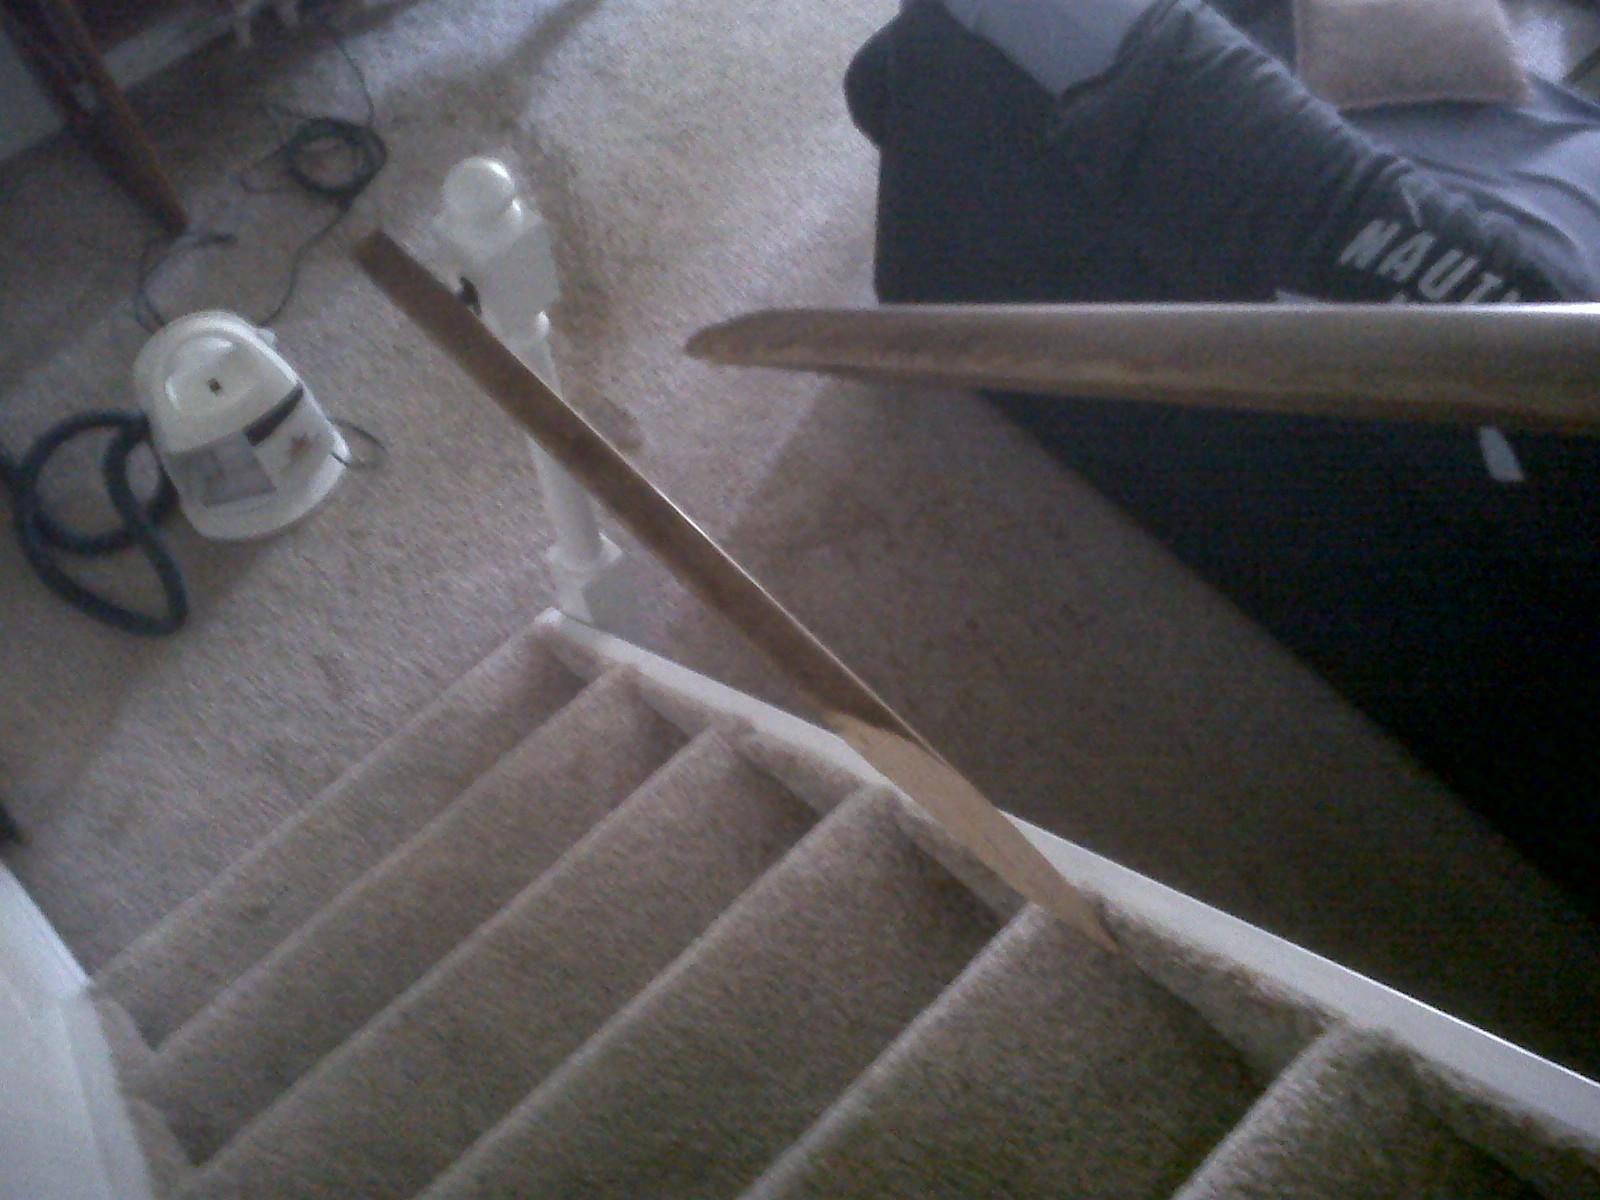 http://1.bp.blogspot.com/_S1LozED3Aek/S83IGqbbPsI/AAAAAAAAADE/hsZ0zOzOths/s1600/stairs.jpg